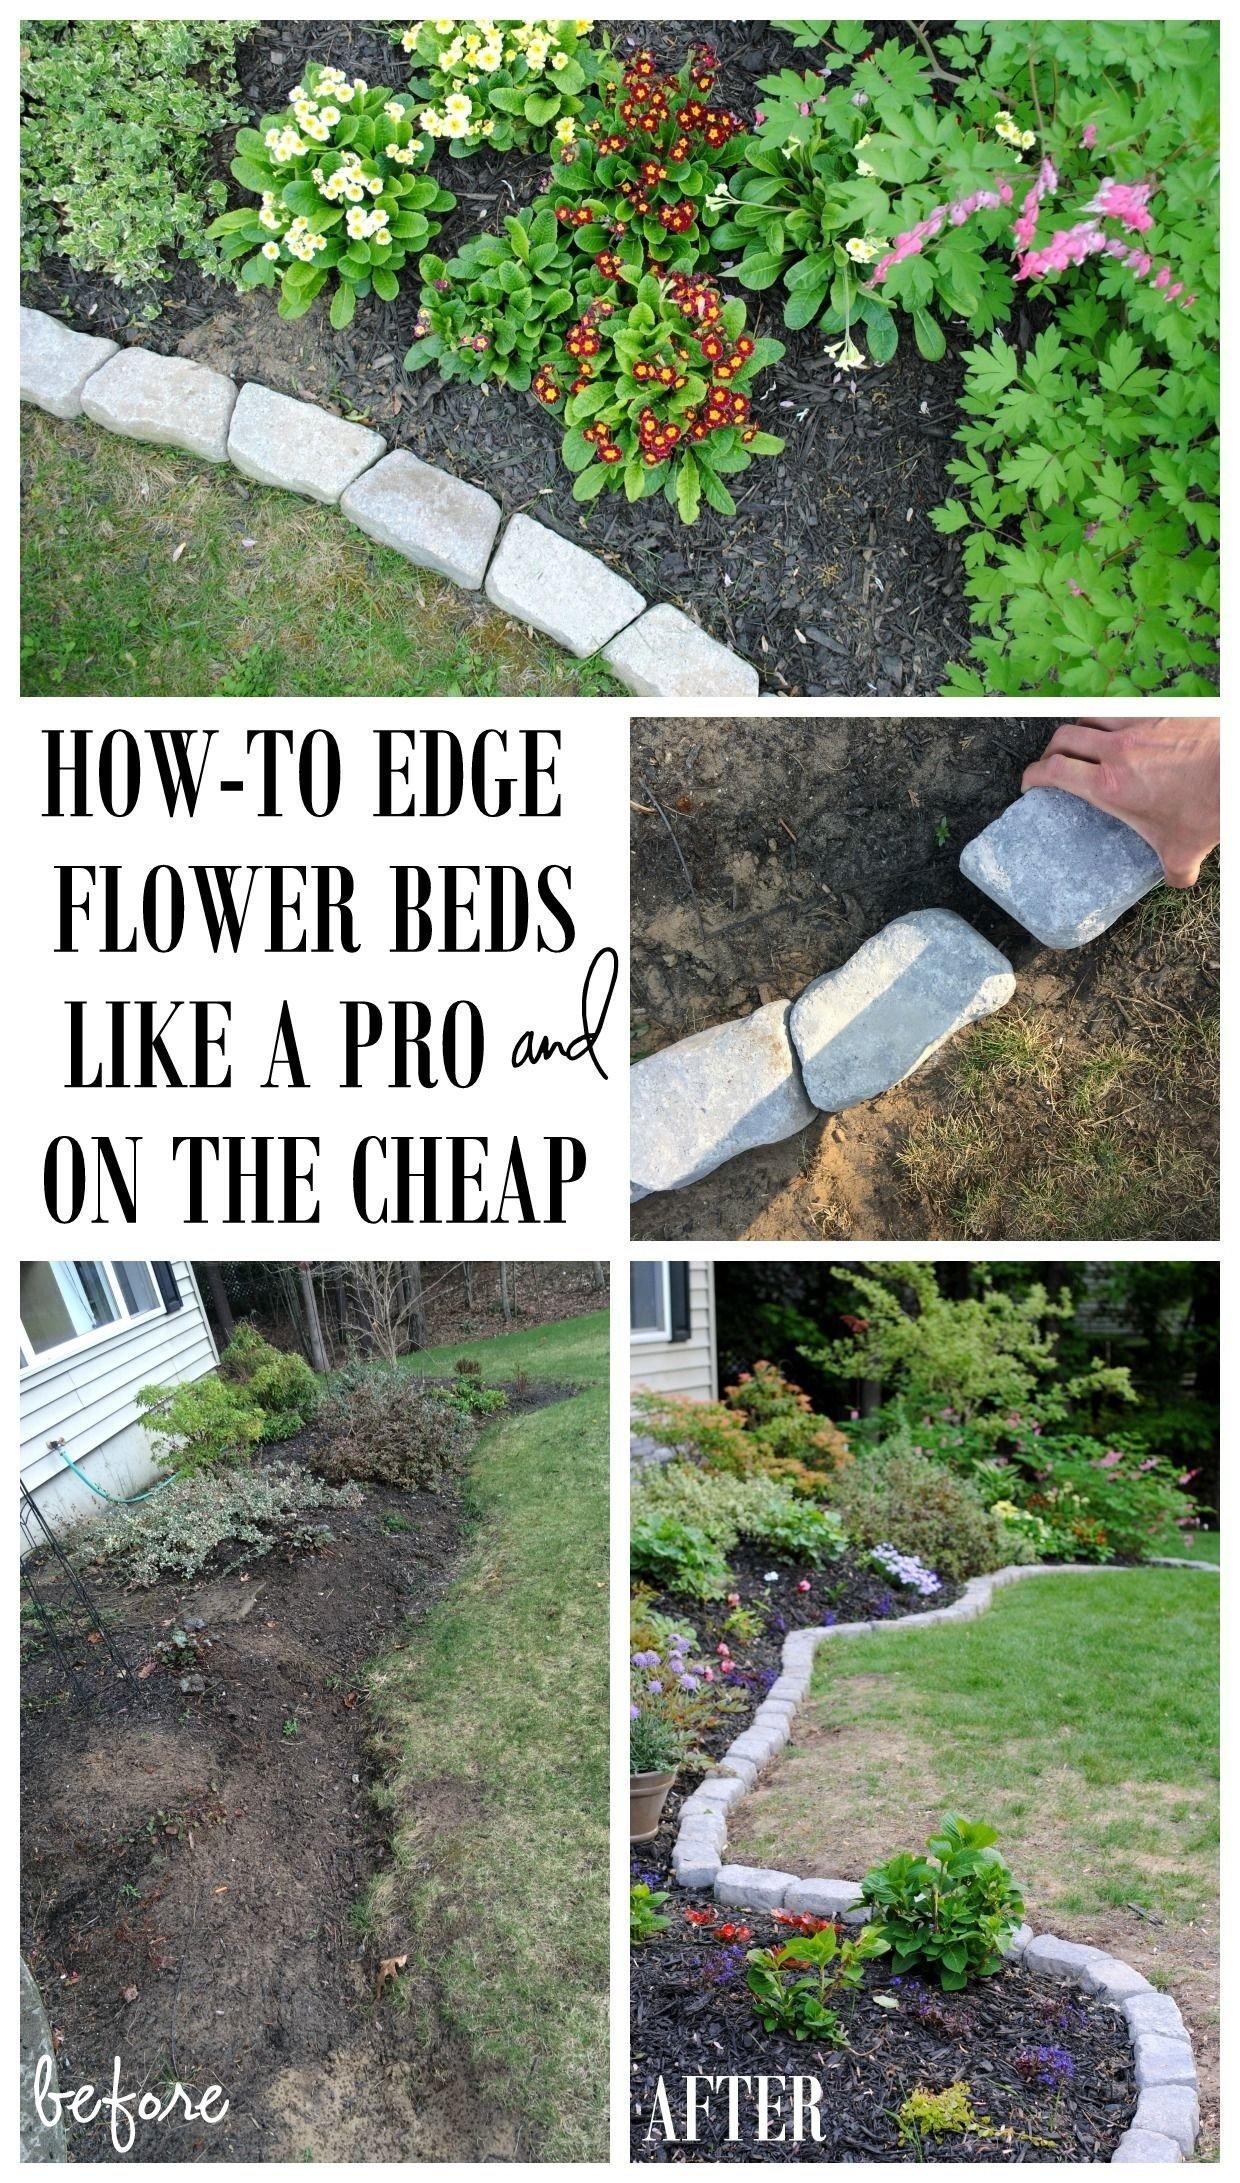 10 Lovable Cheap Flower Bed Edging Ideas pinjenna burger on best of pinterest pinterest garden edging 1 2021